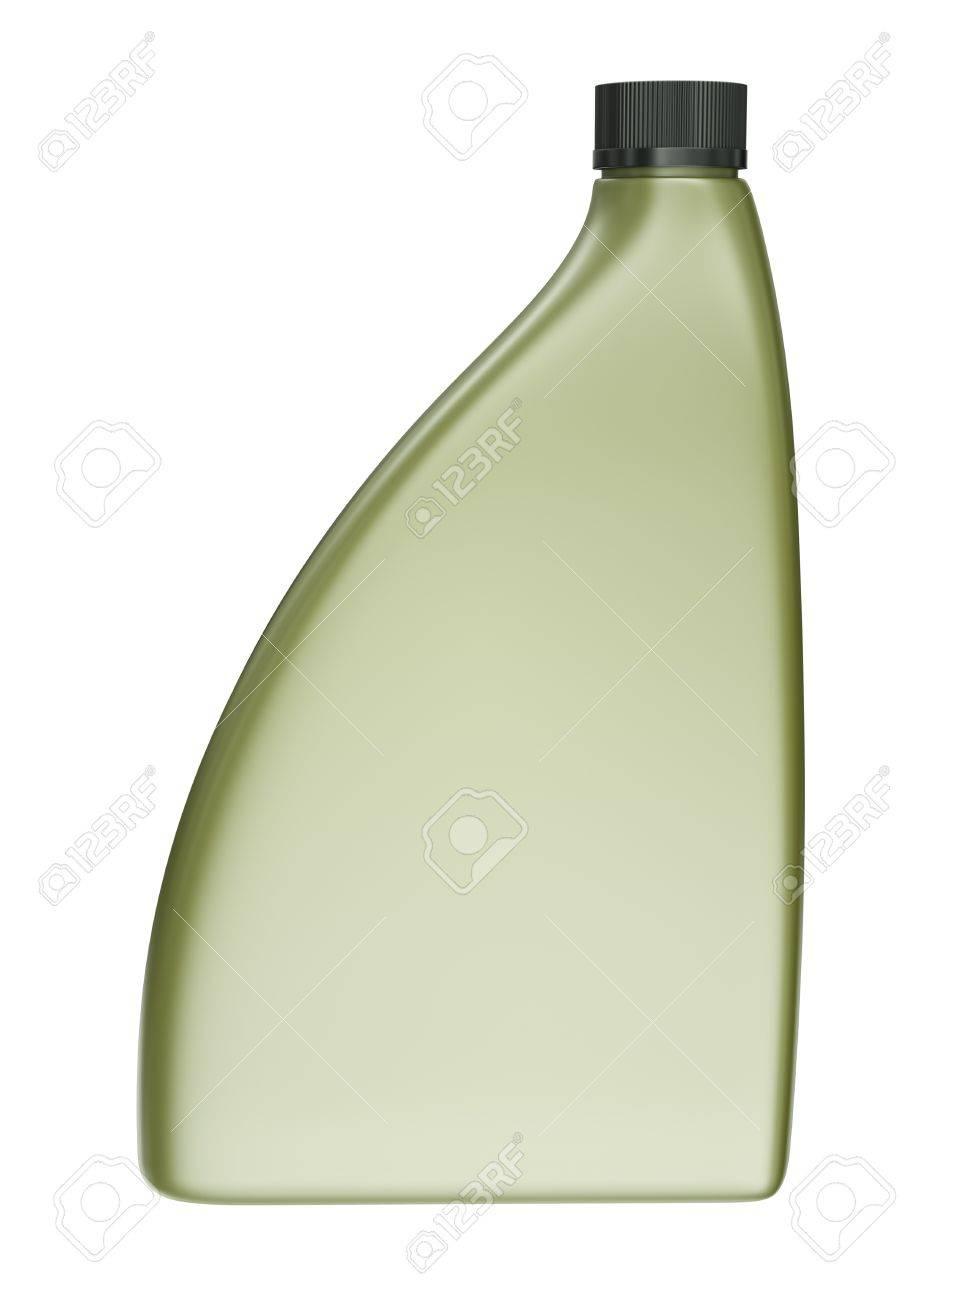 Blank engine oil bottle isolated on white background. 3D render Stock Photo - 12727276